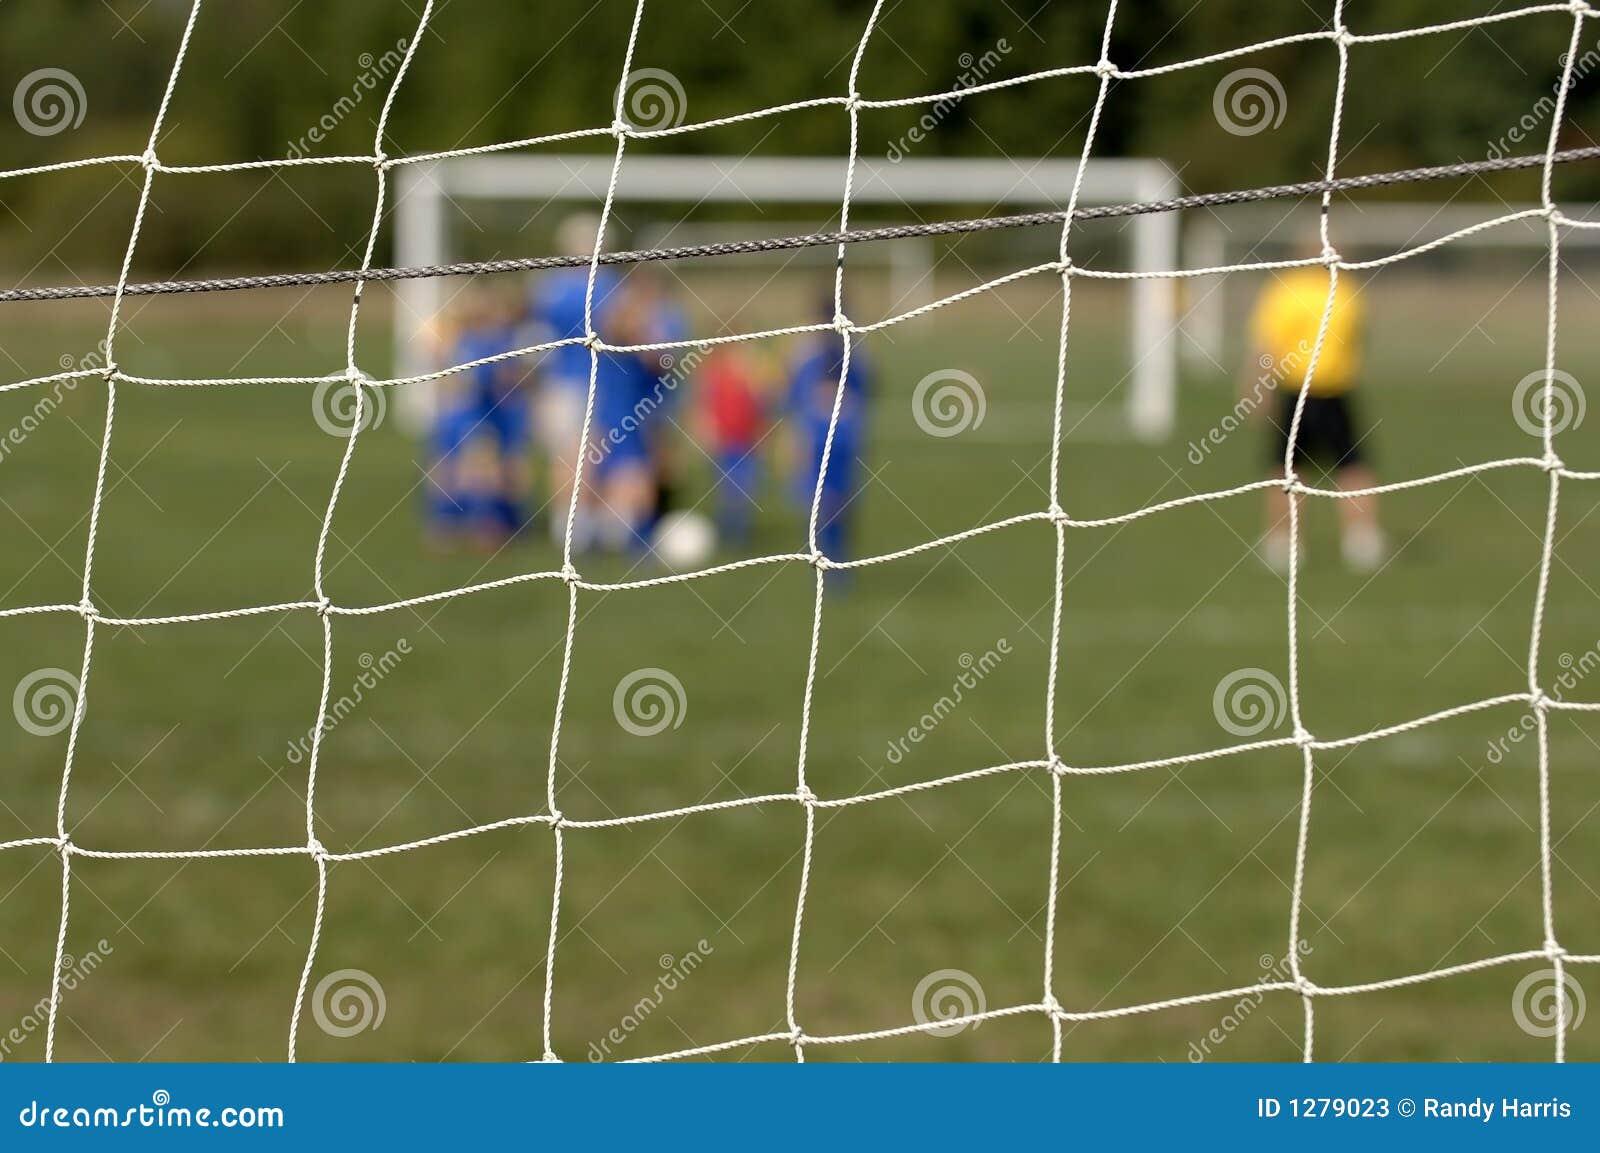 Soccer Team through net